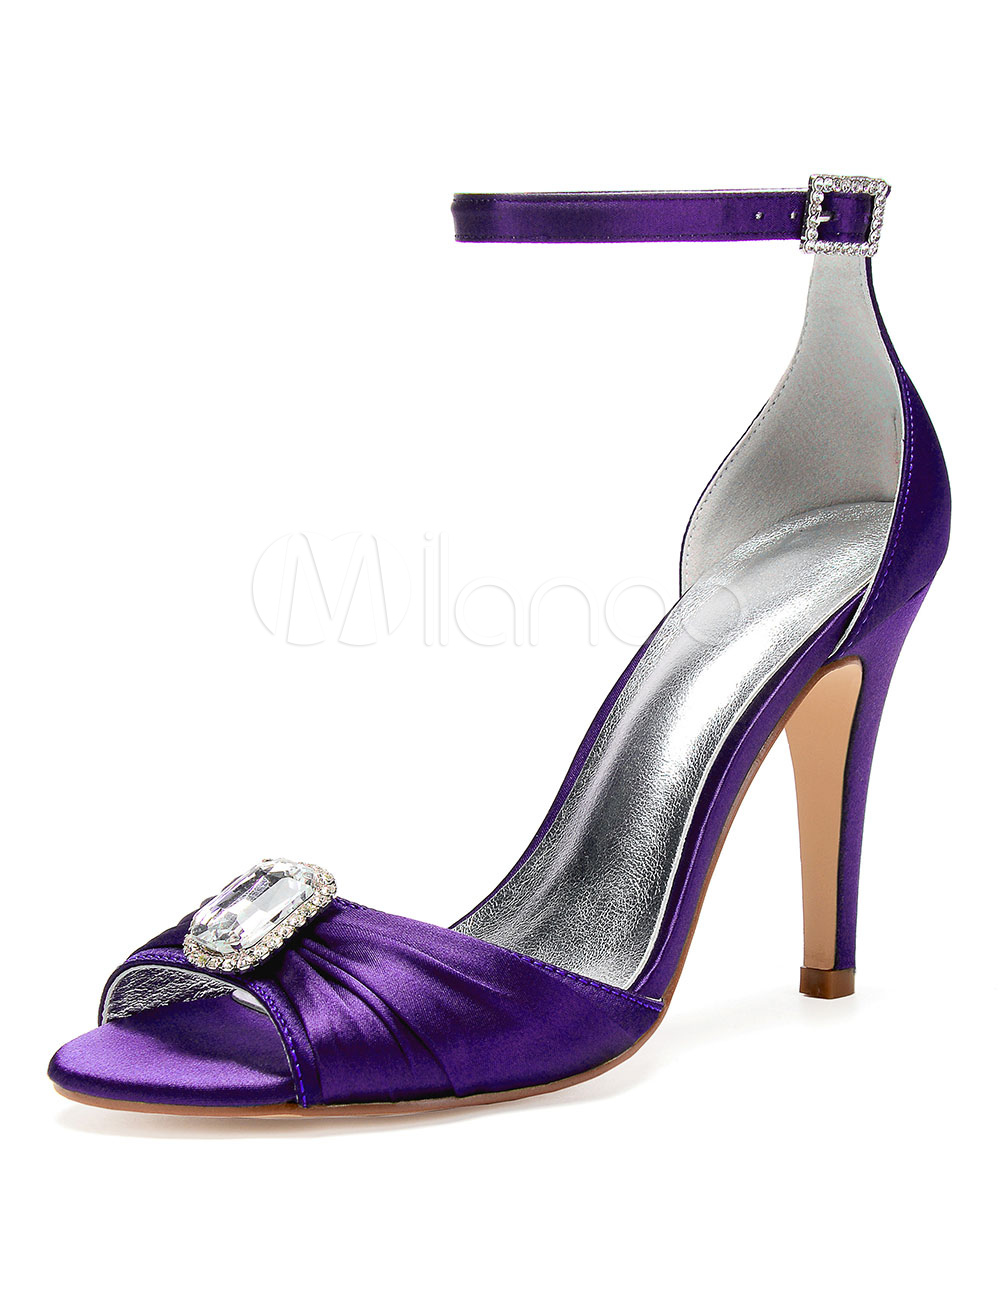 7fceed056b Satin Mother Shoes Purple Open Toe Rhinestones Wedding Shoes High Heel  Bridal Sandals